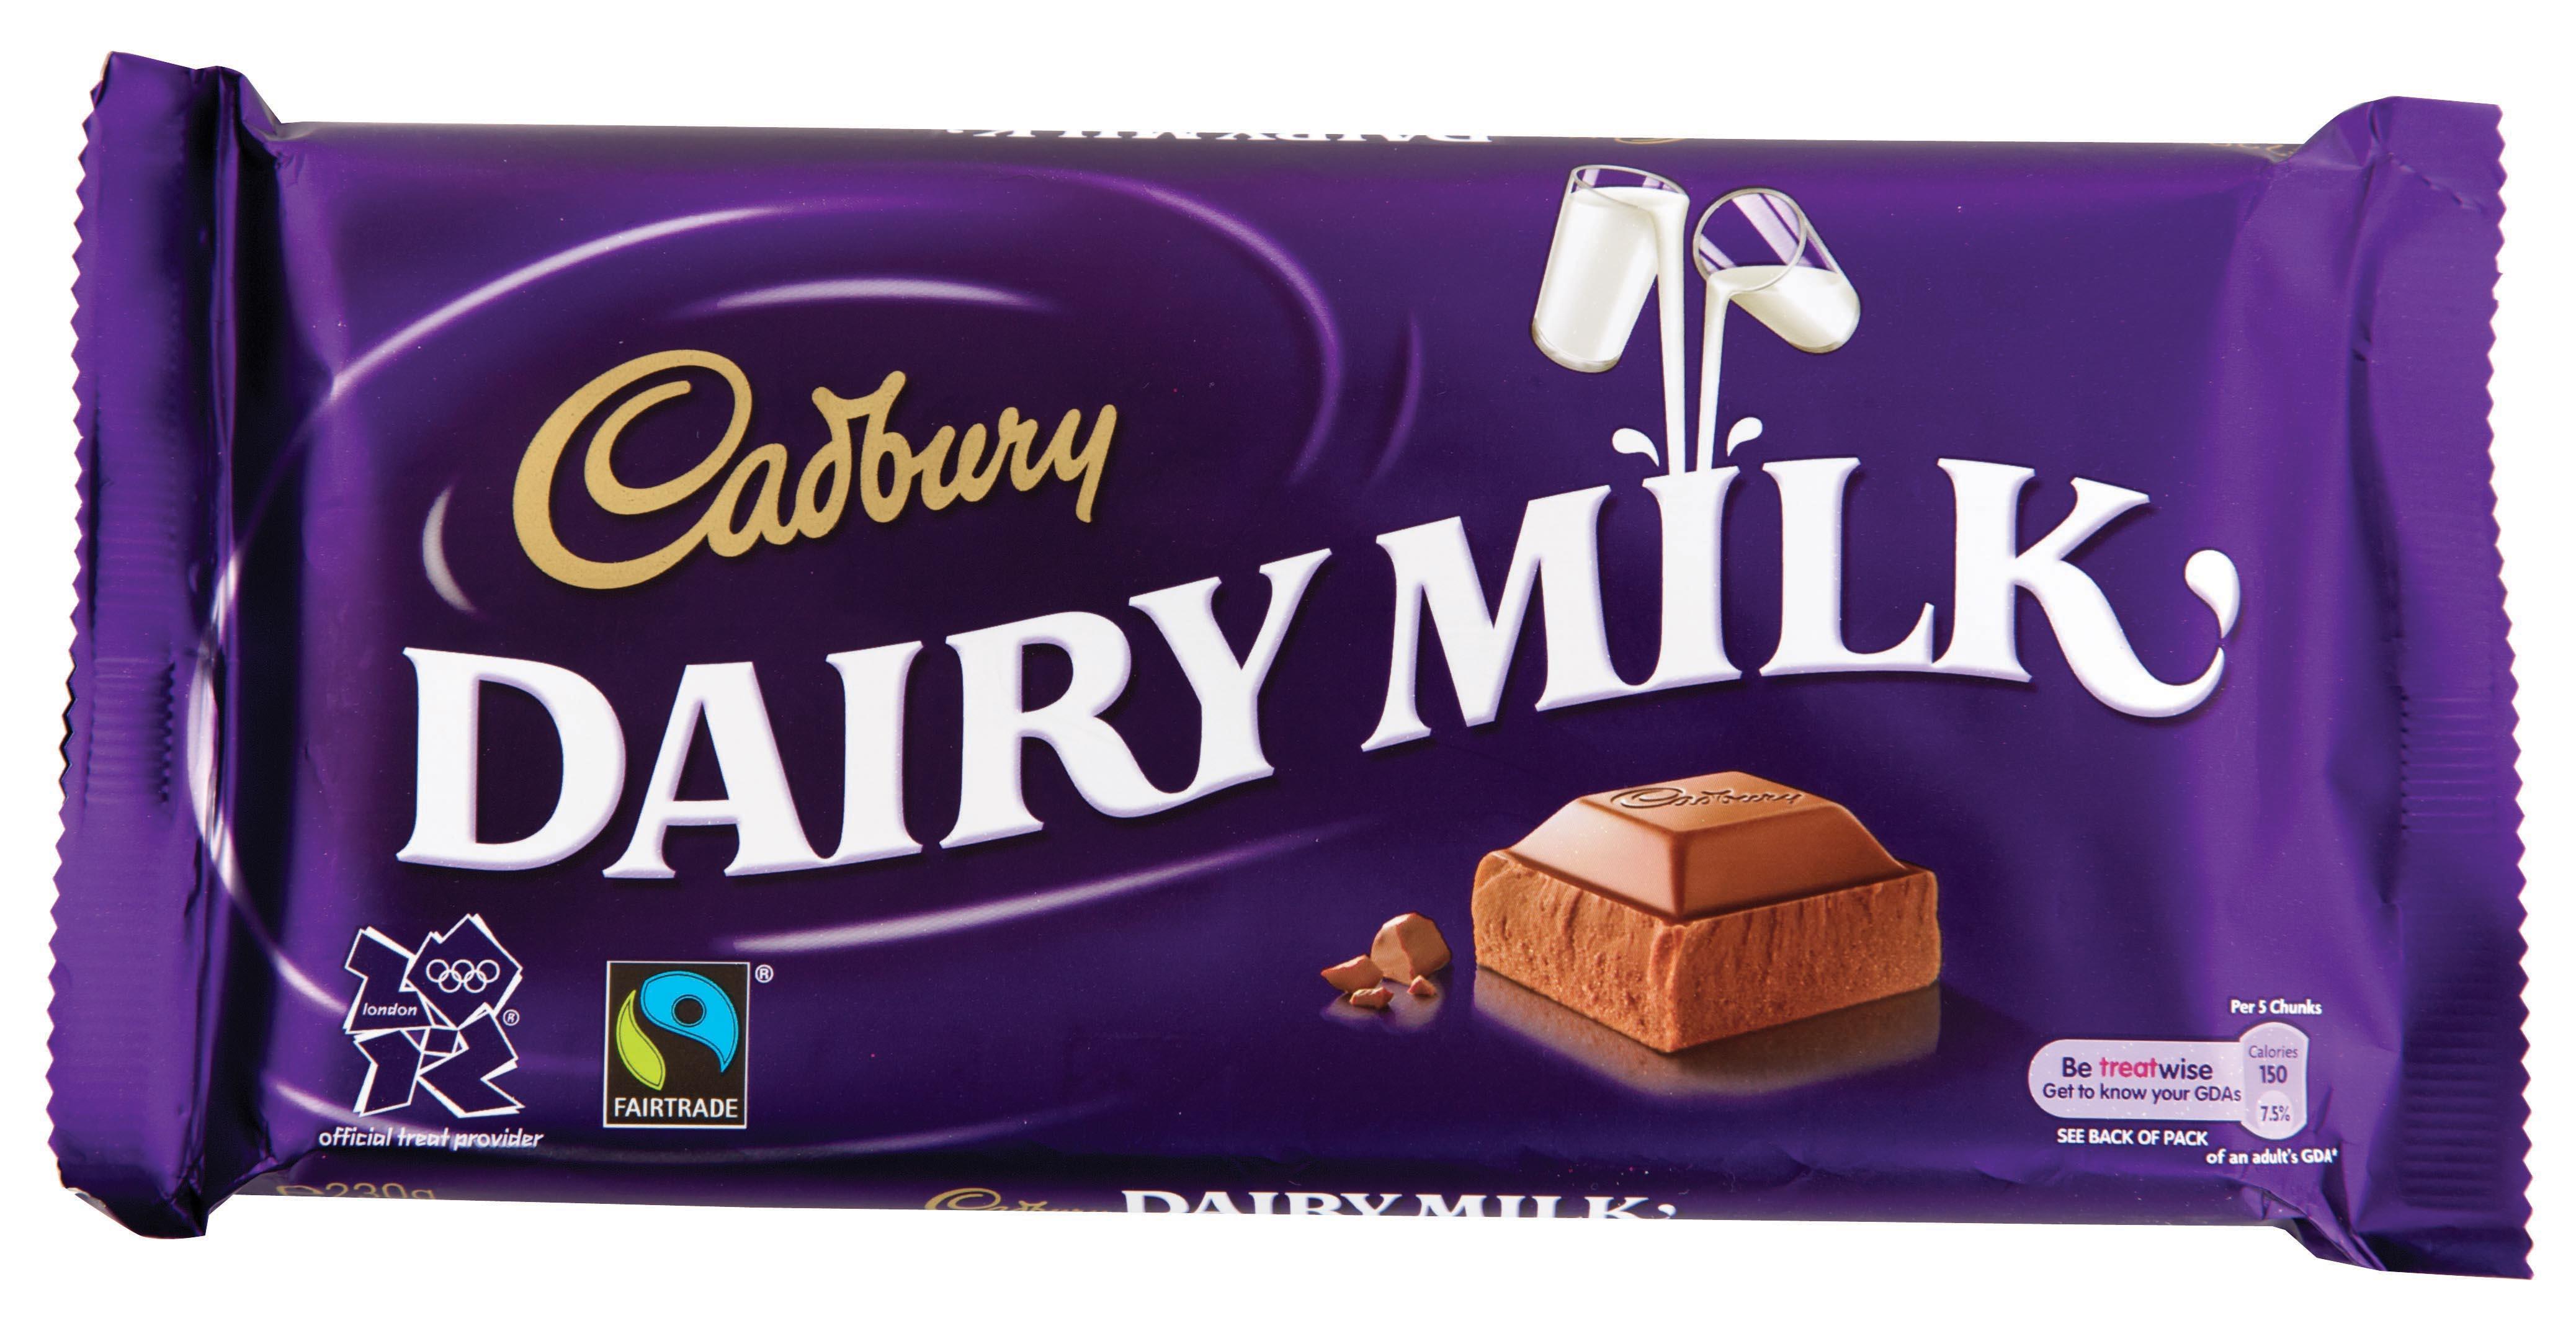 Cadbury Chocolate Bar Wrappers